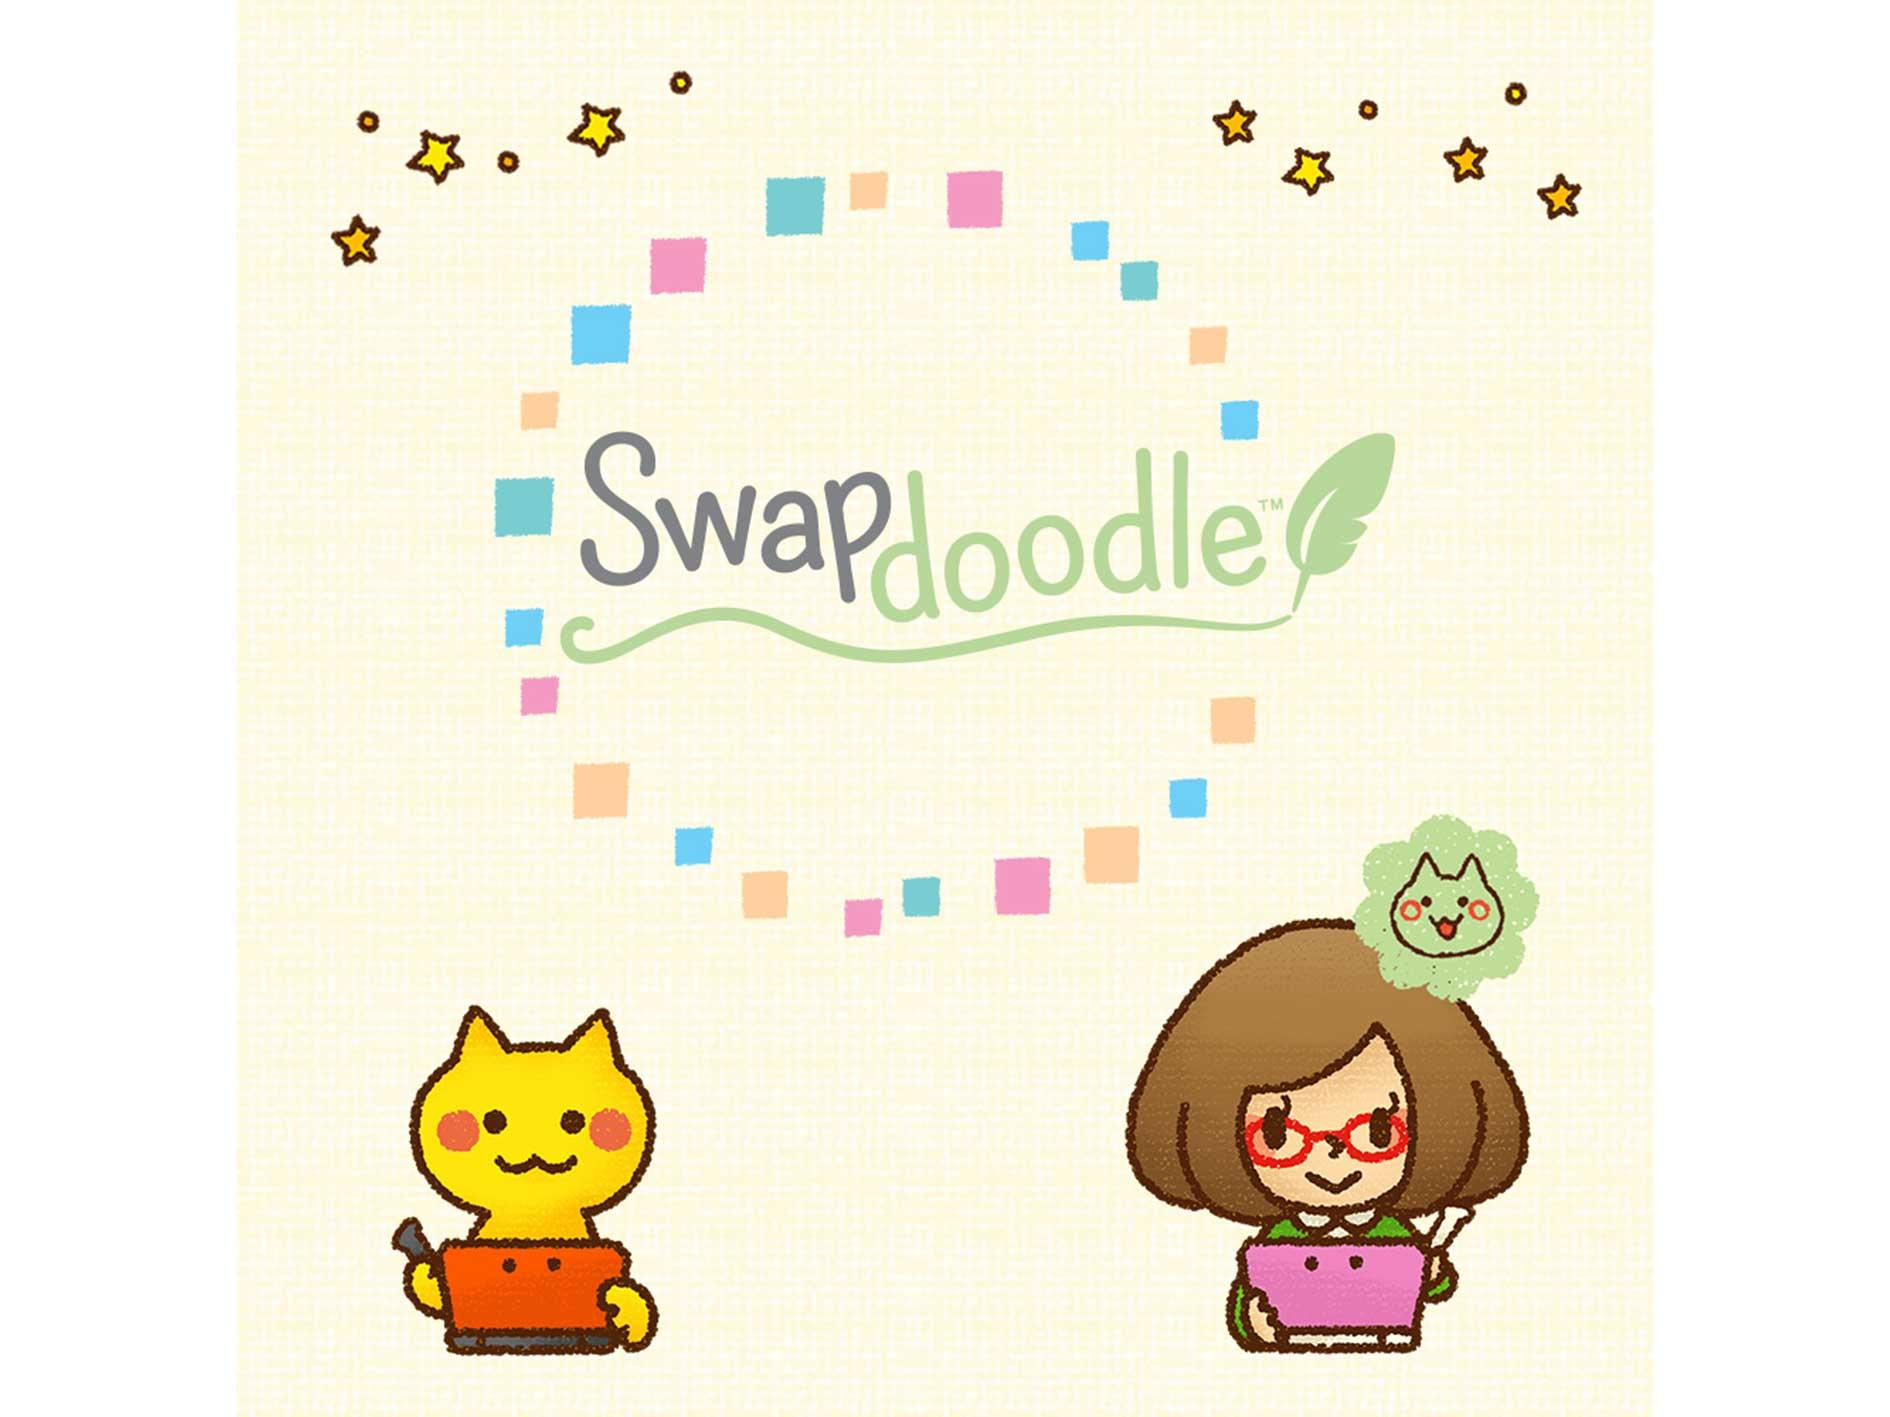 swapdoodle-logo